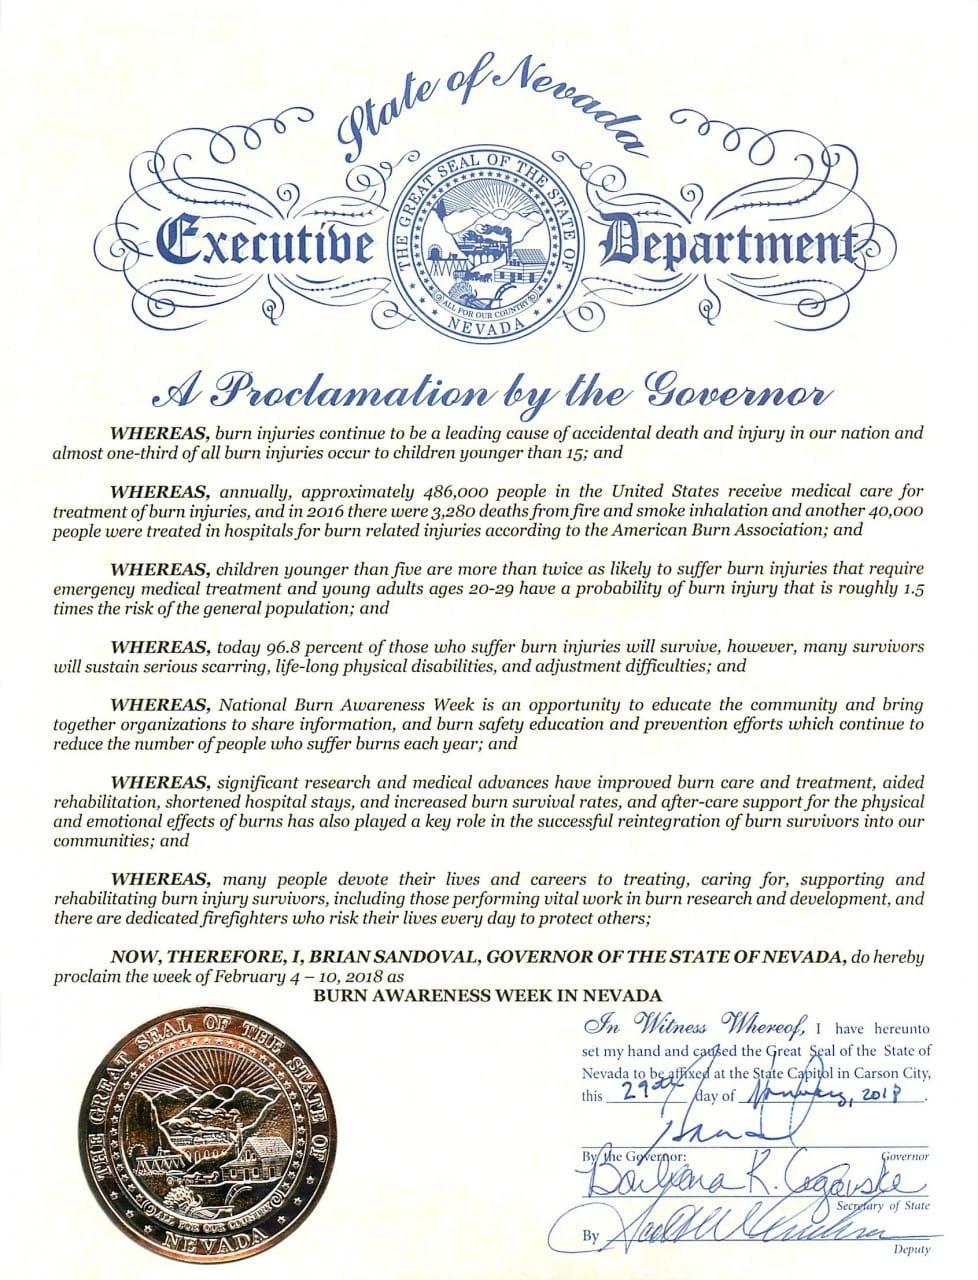 Governor's Proclamation - Burn Awareness Week